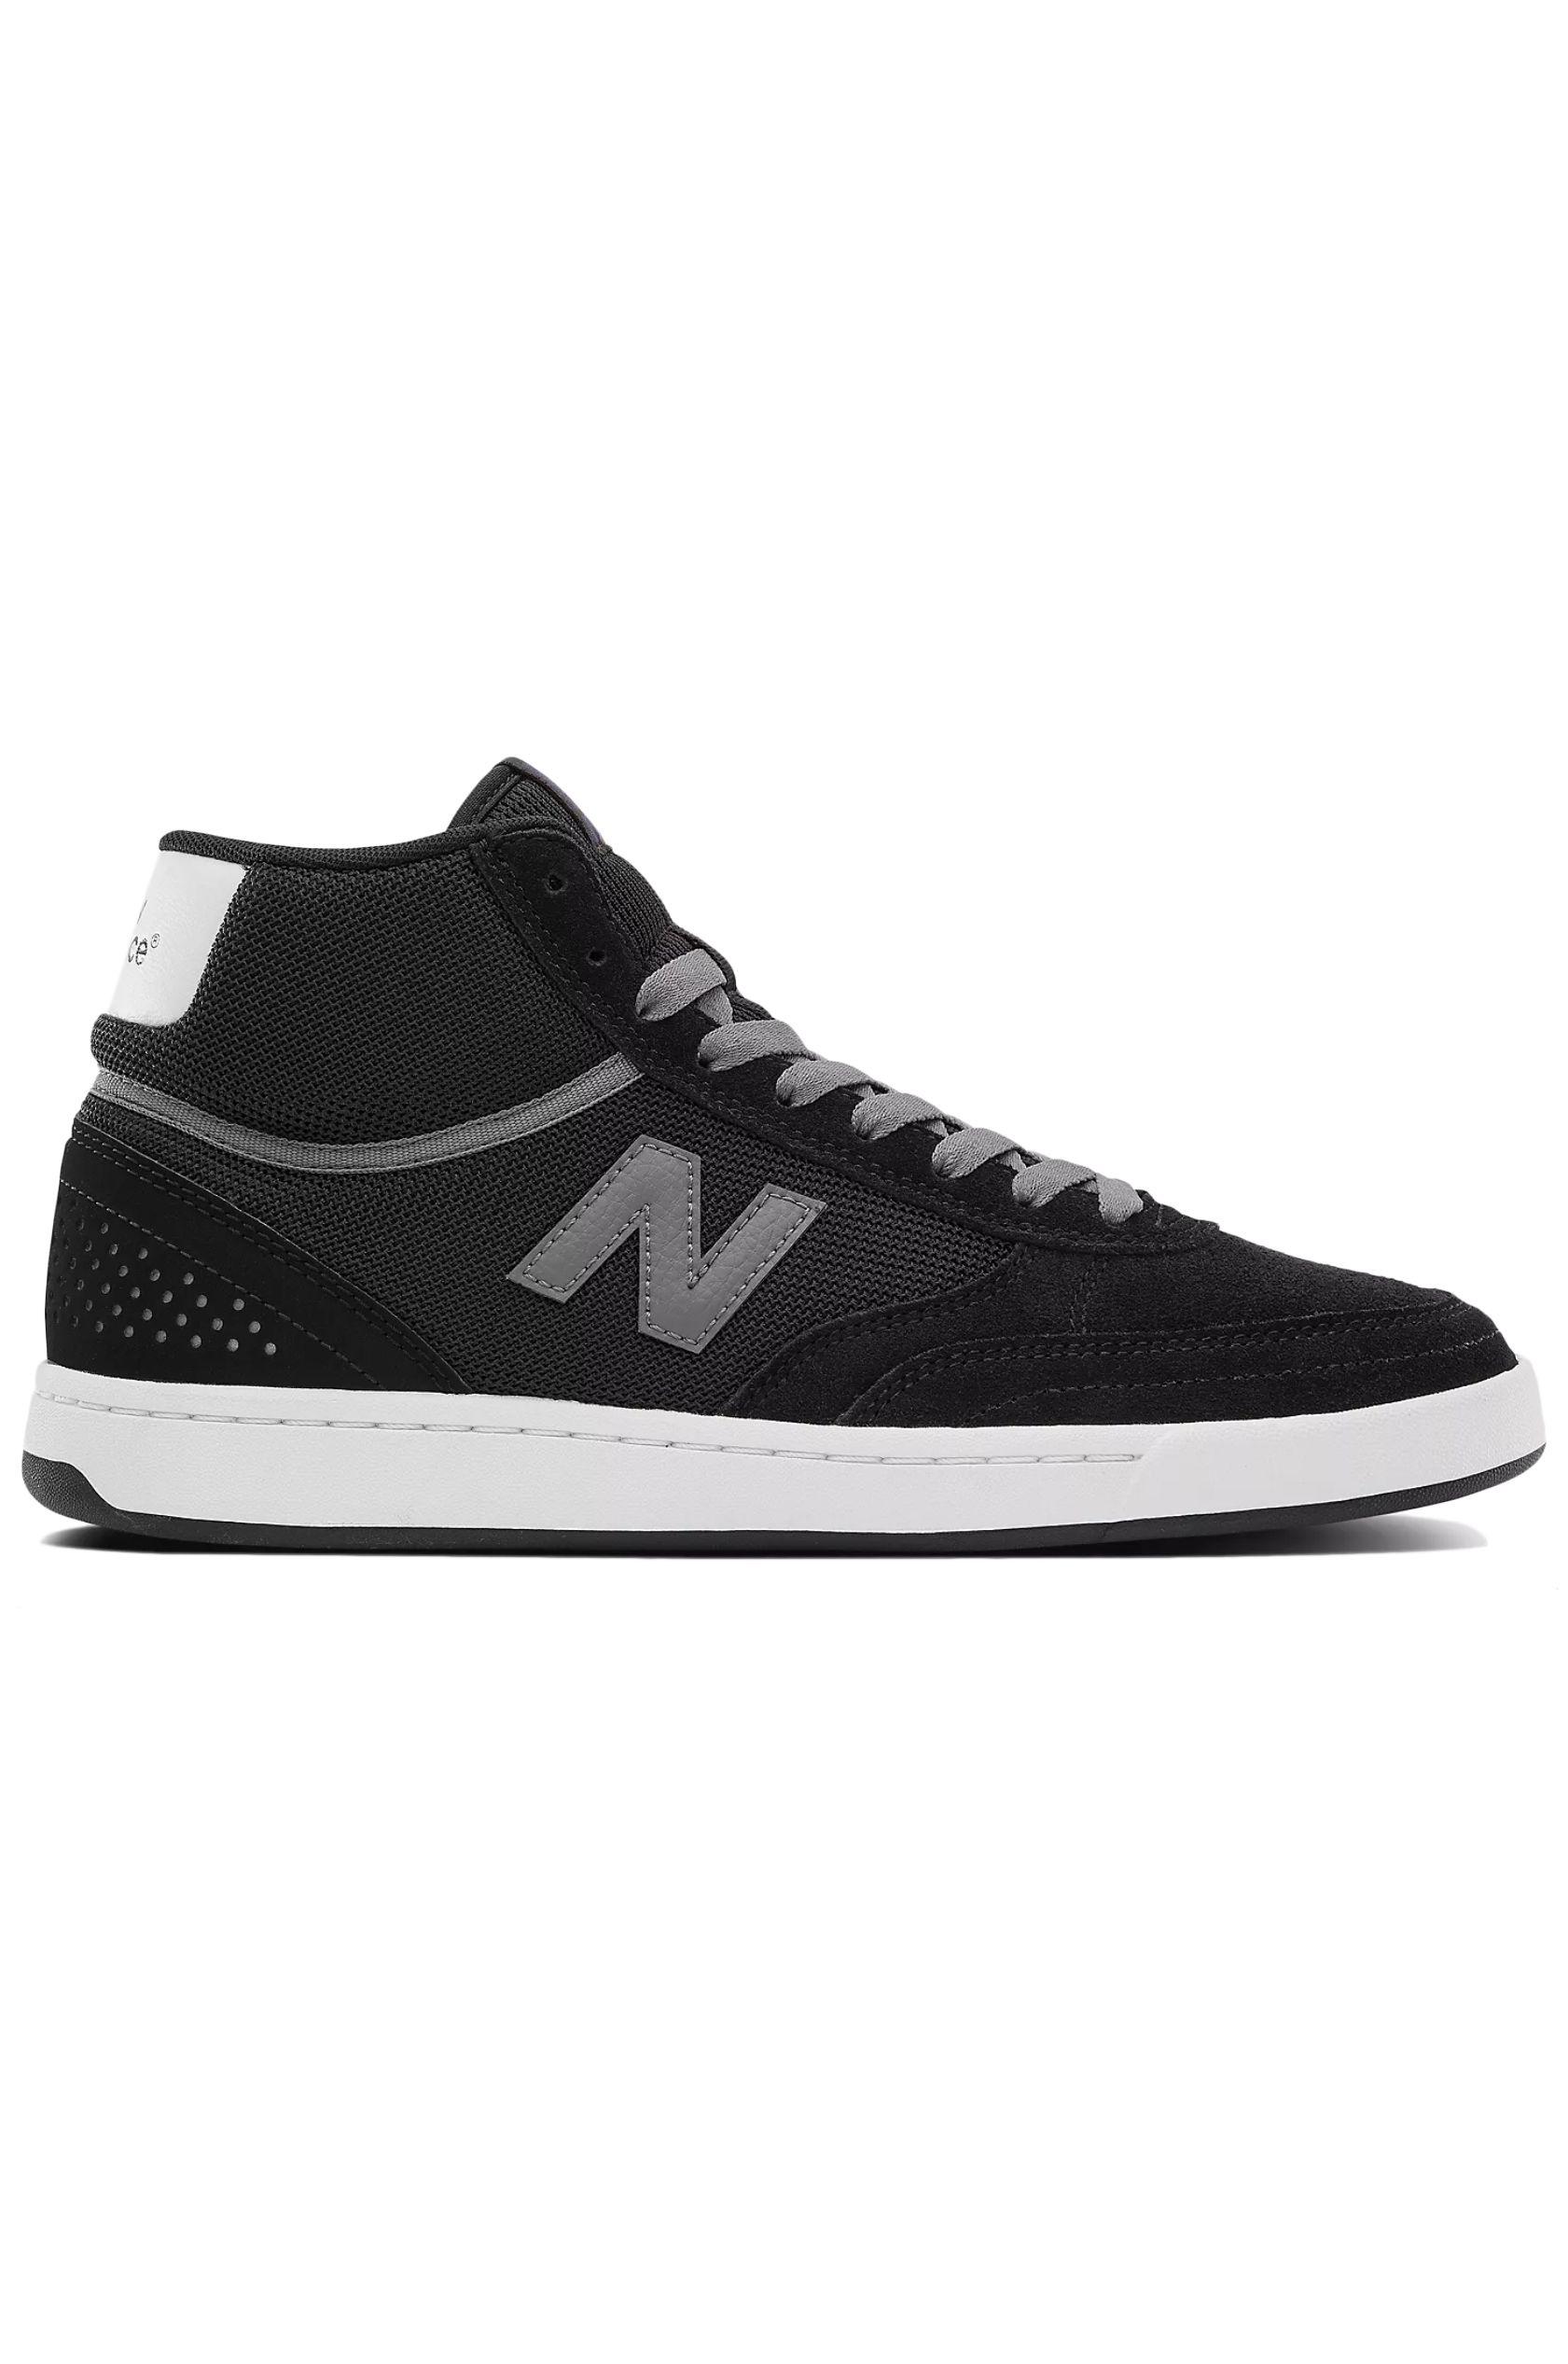 New Balance Shoes NM440 Black/Grey